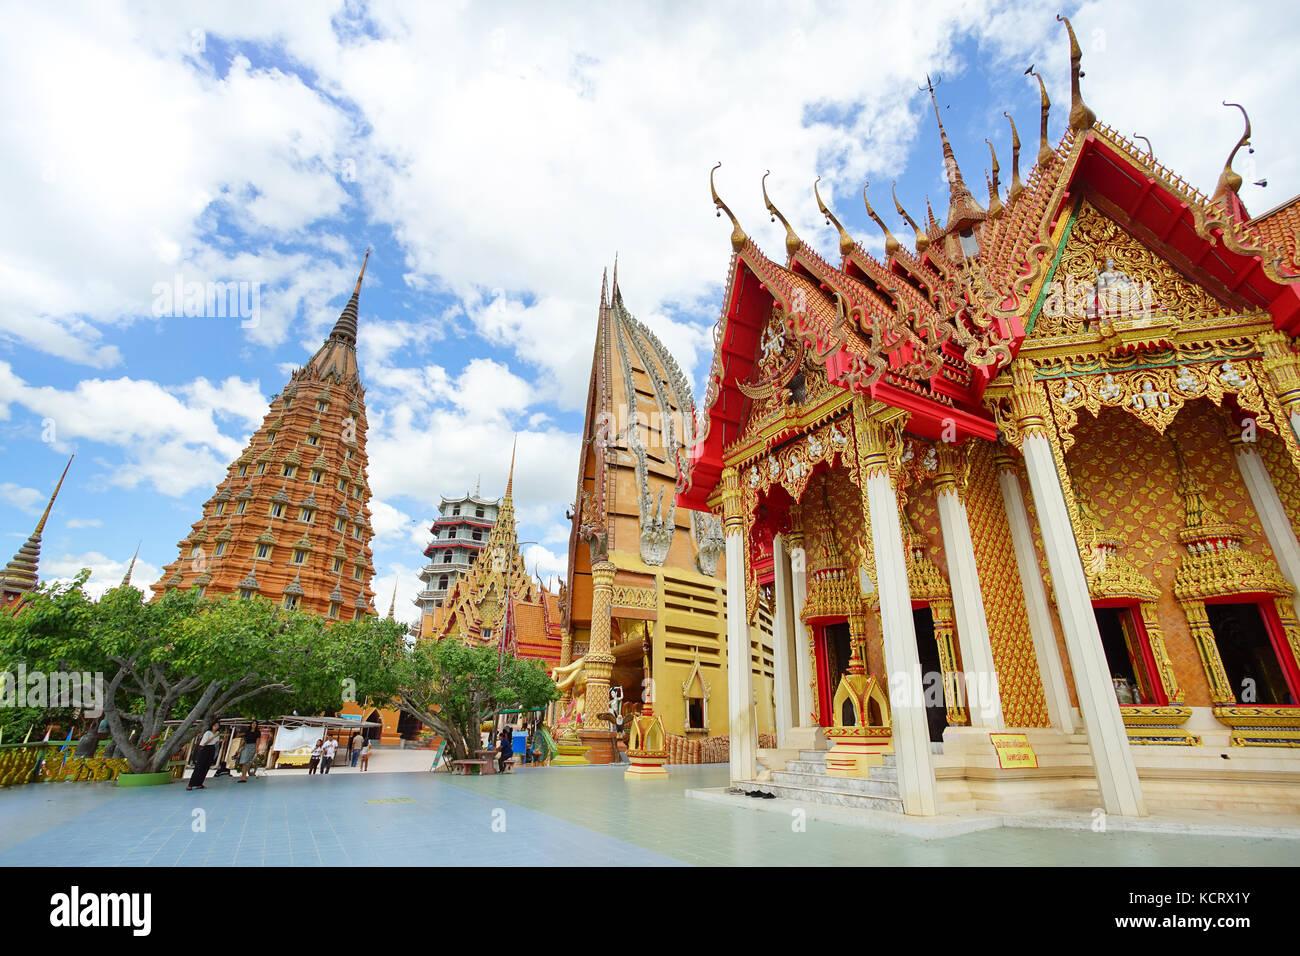 KANCHANABURI, THAILAND - July 7, 2017: Wat Tham Sua is the most beautiful temple in Kanchanaburi, Thailand. July - Stock Image